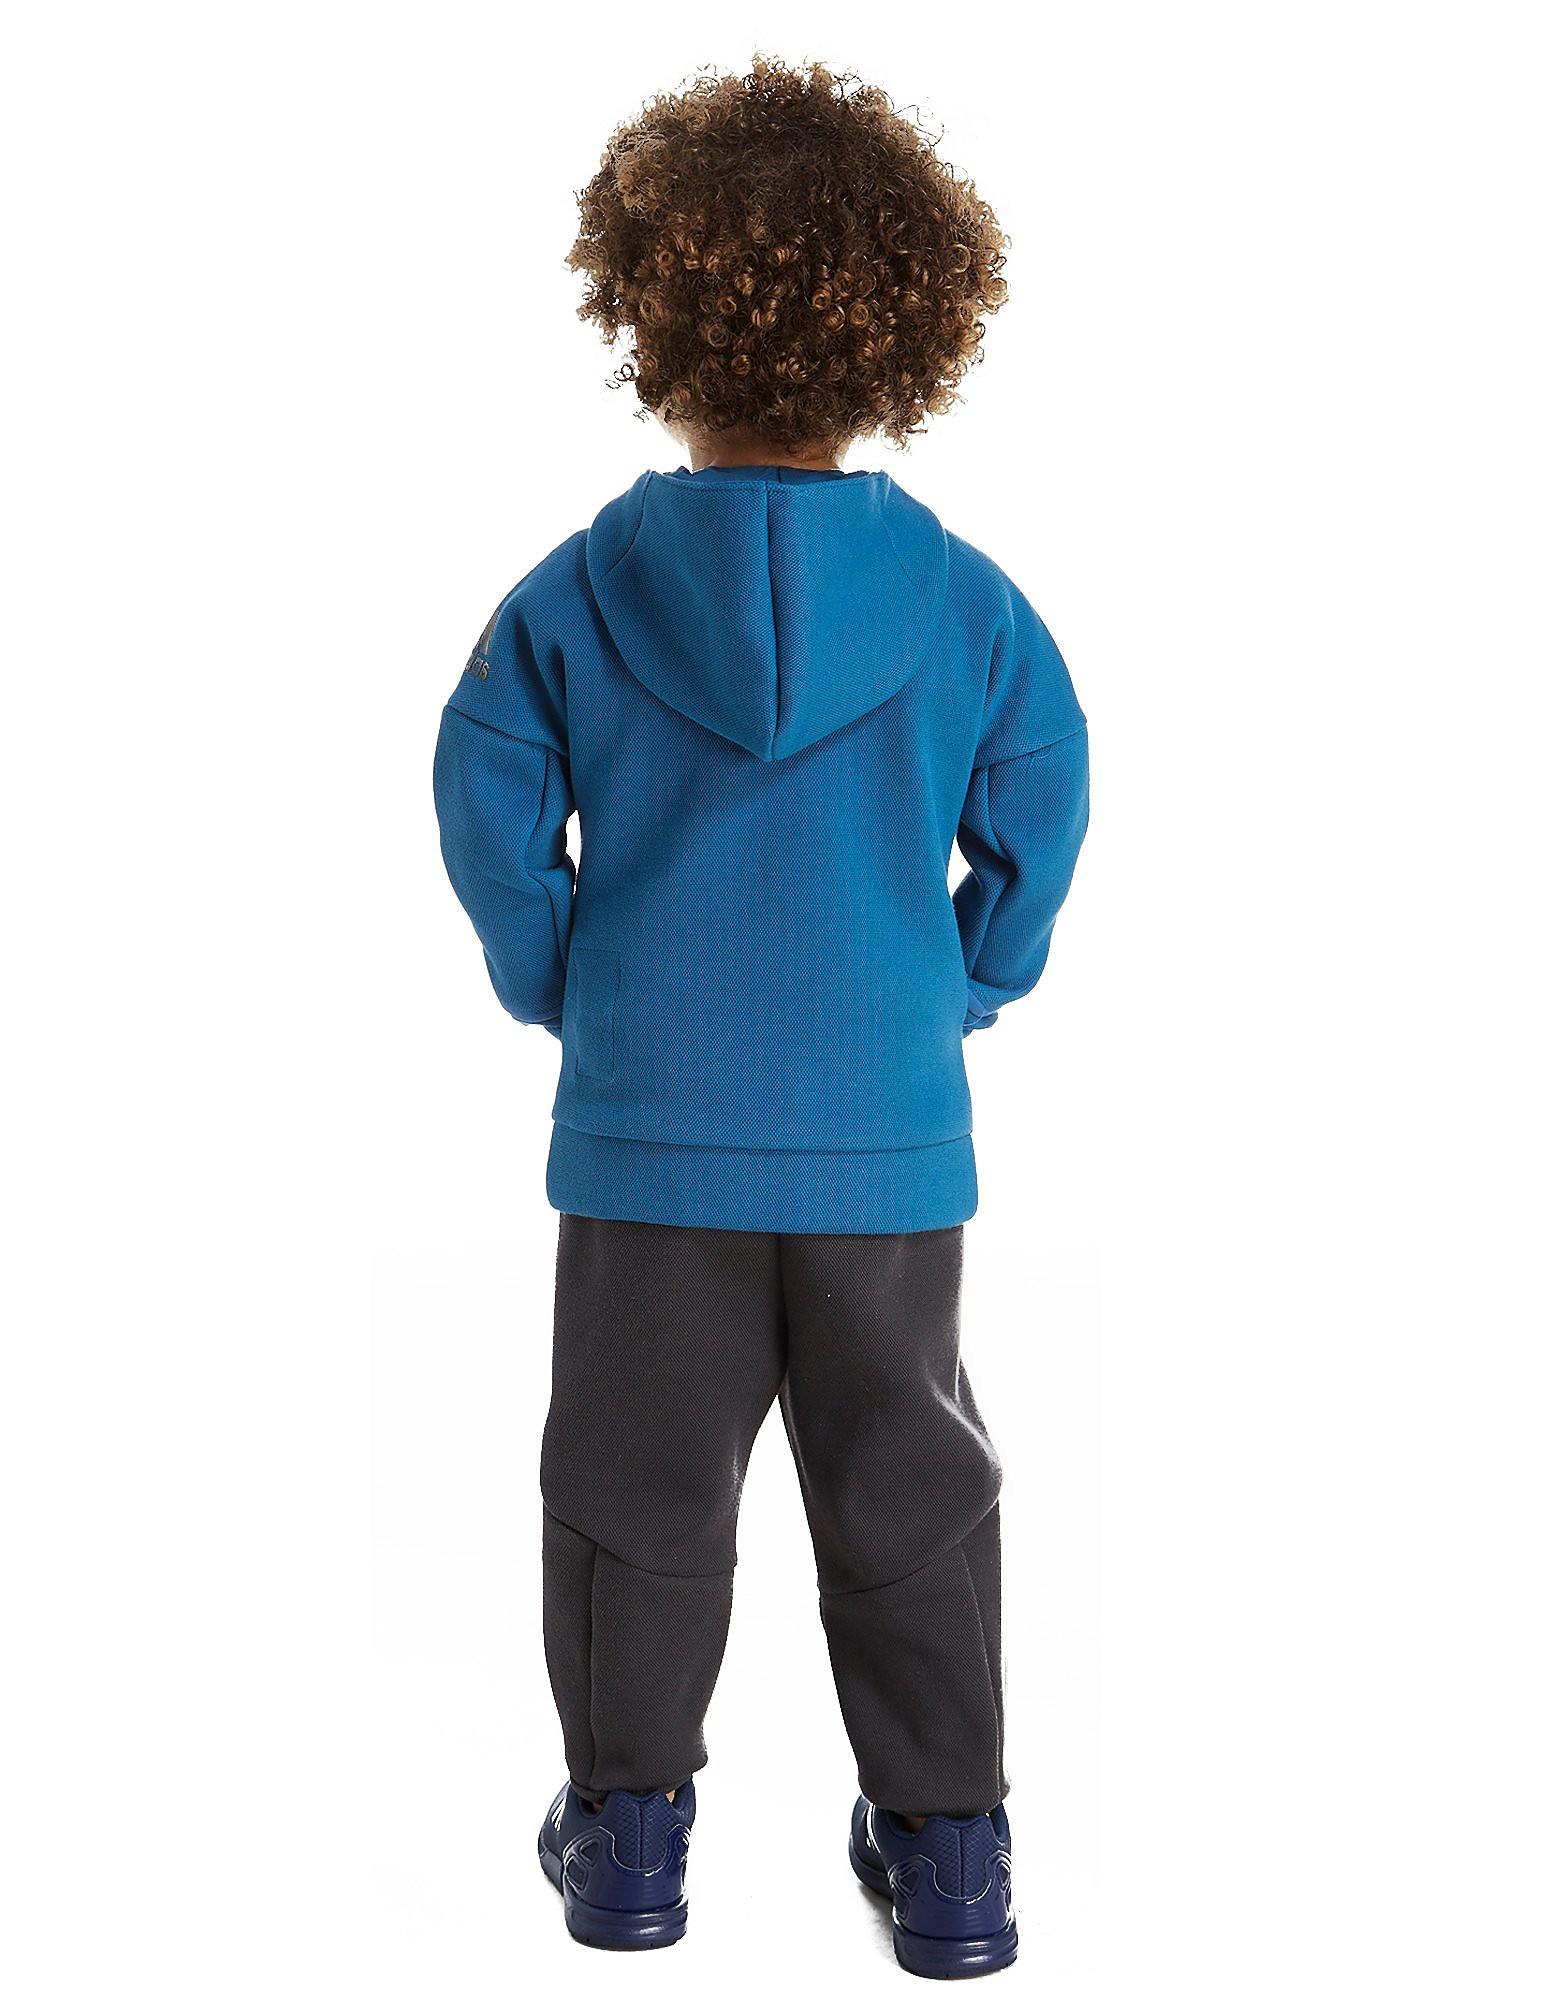 adidas Zone Suit Infant